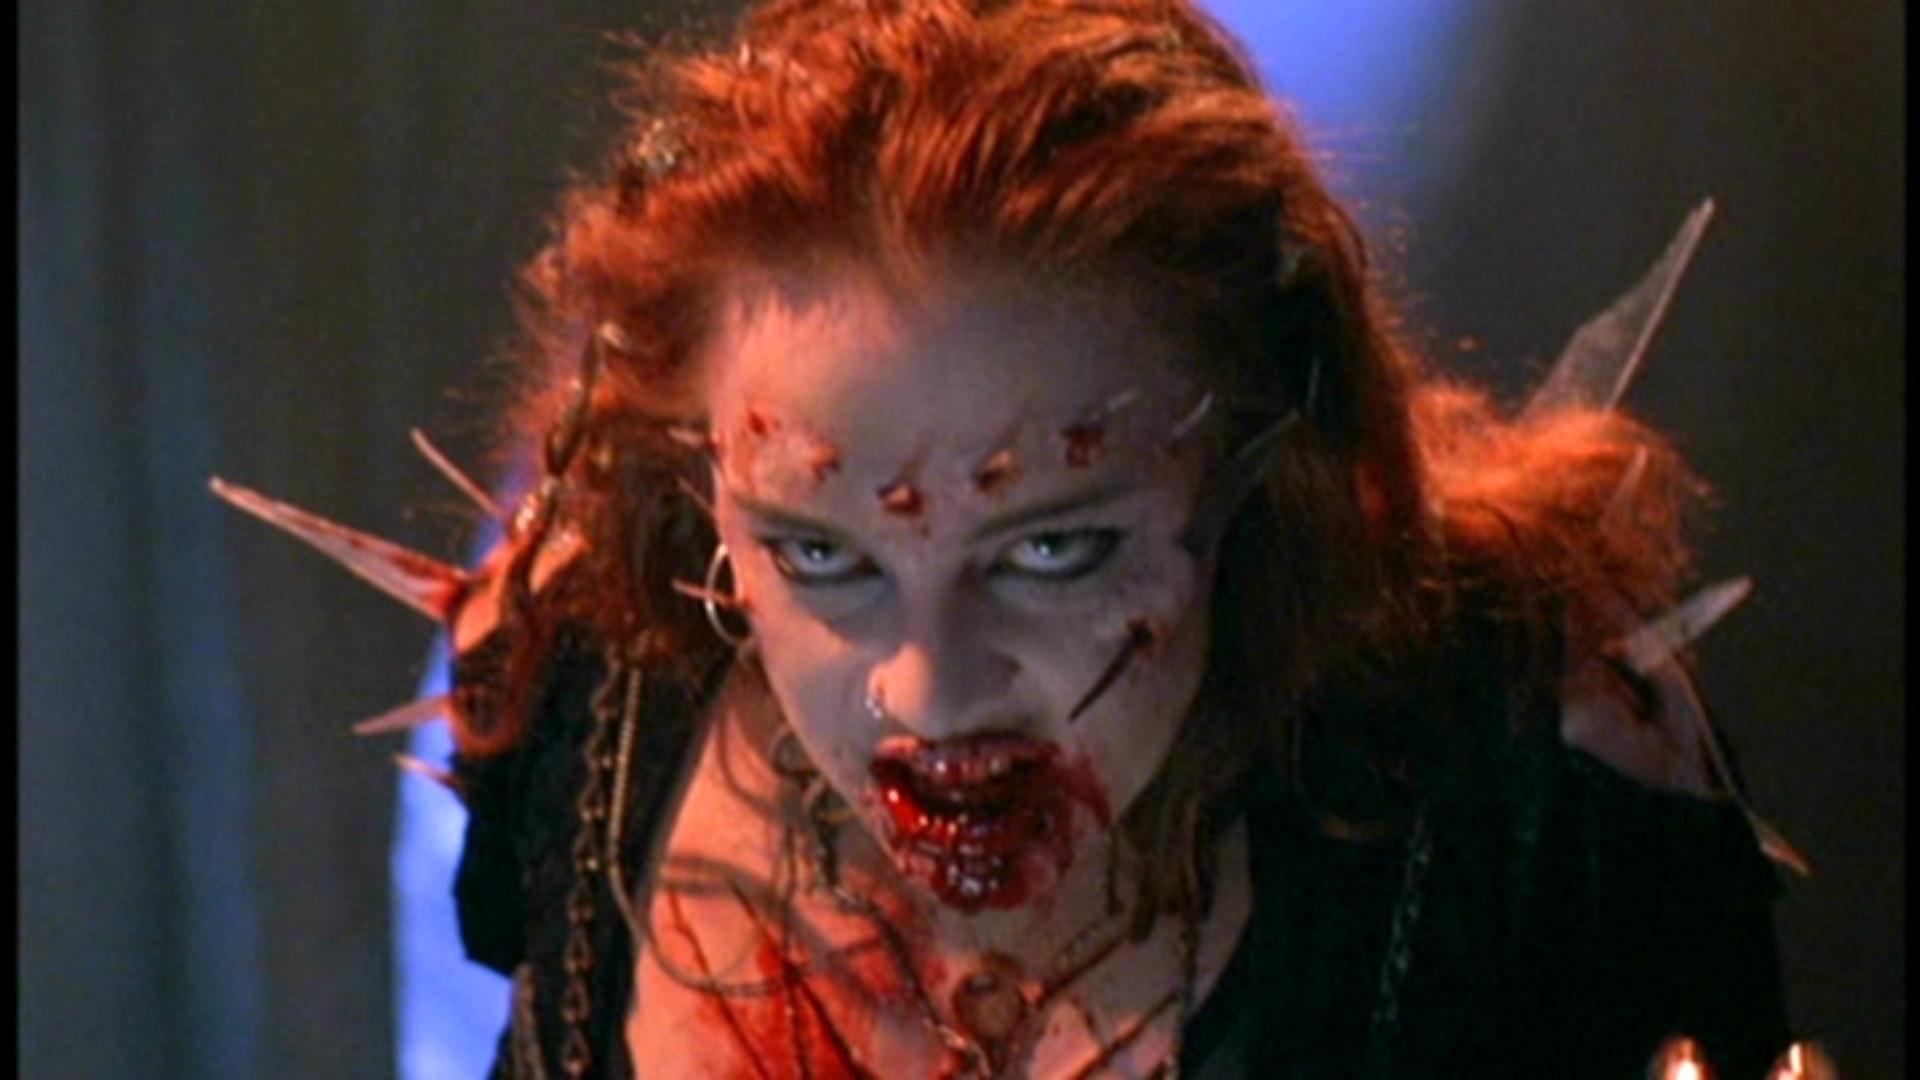 Filme Mortos Vivos within 644 – a volta dos mortos-vivos 3 (1993) – 101 horror movies